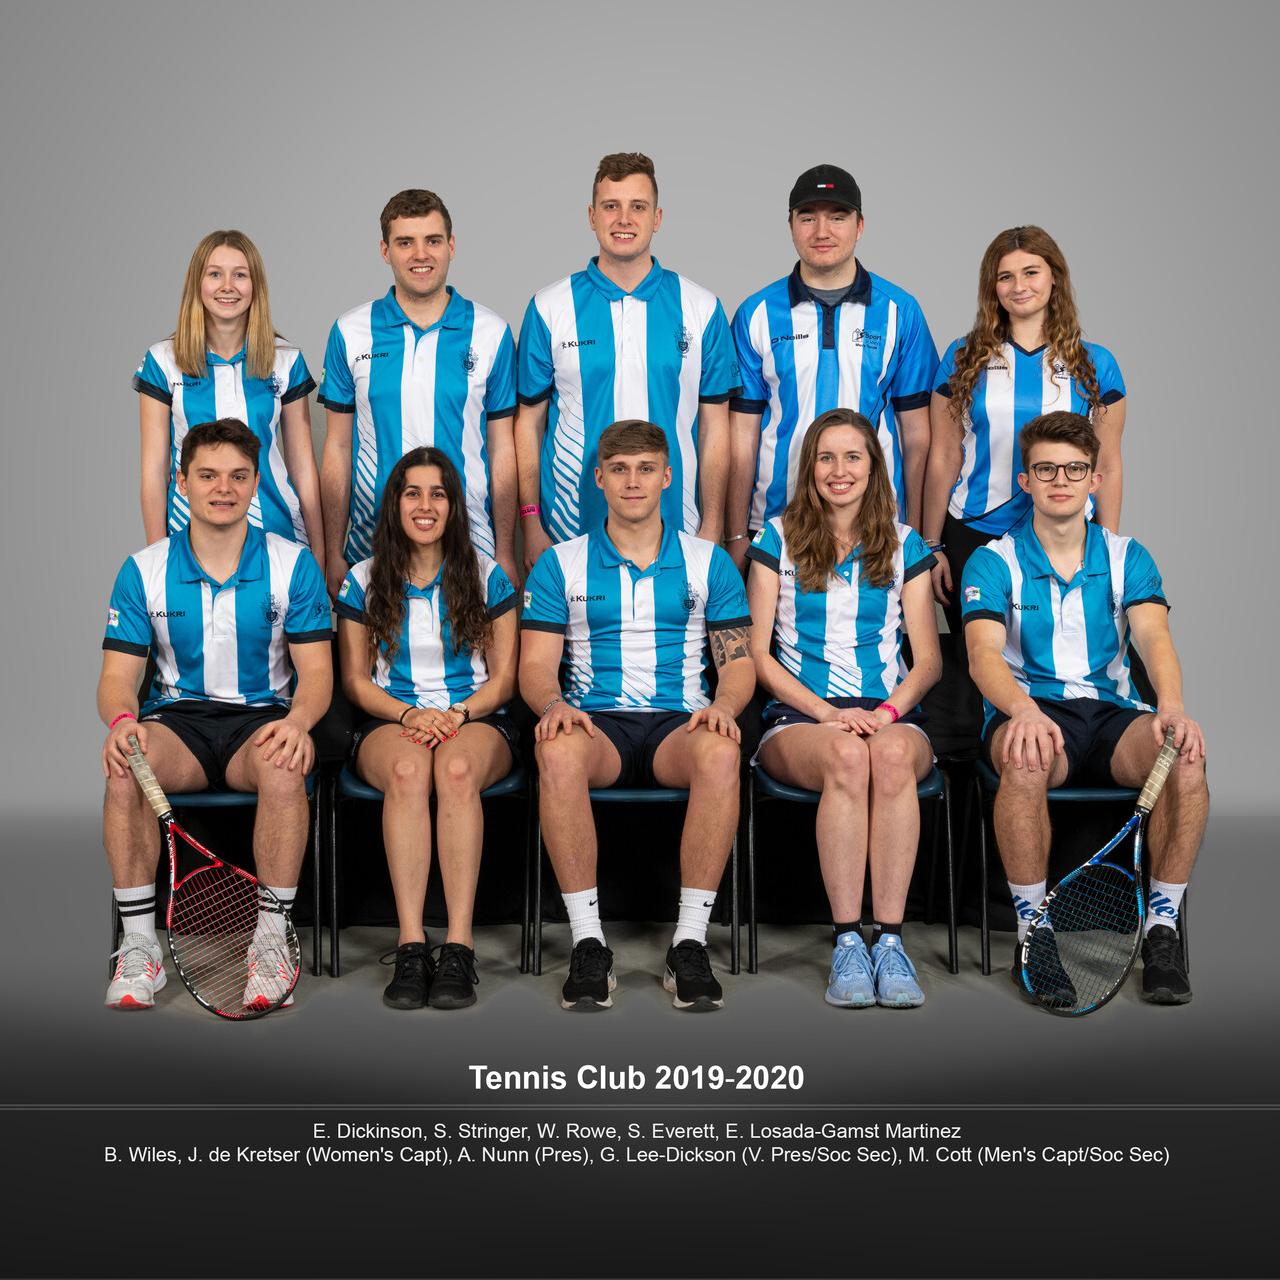 Full team photo of the Tennis Club